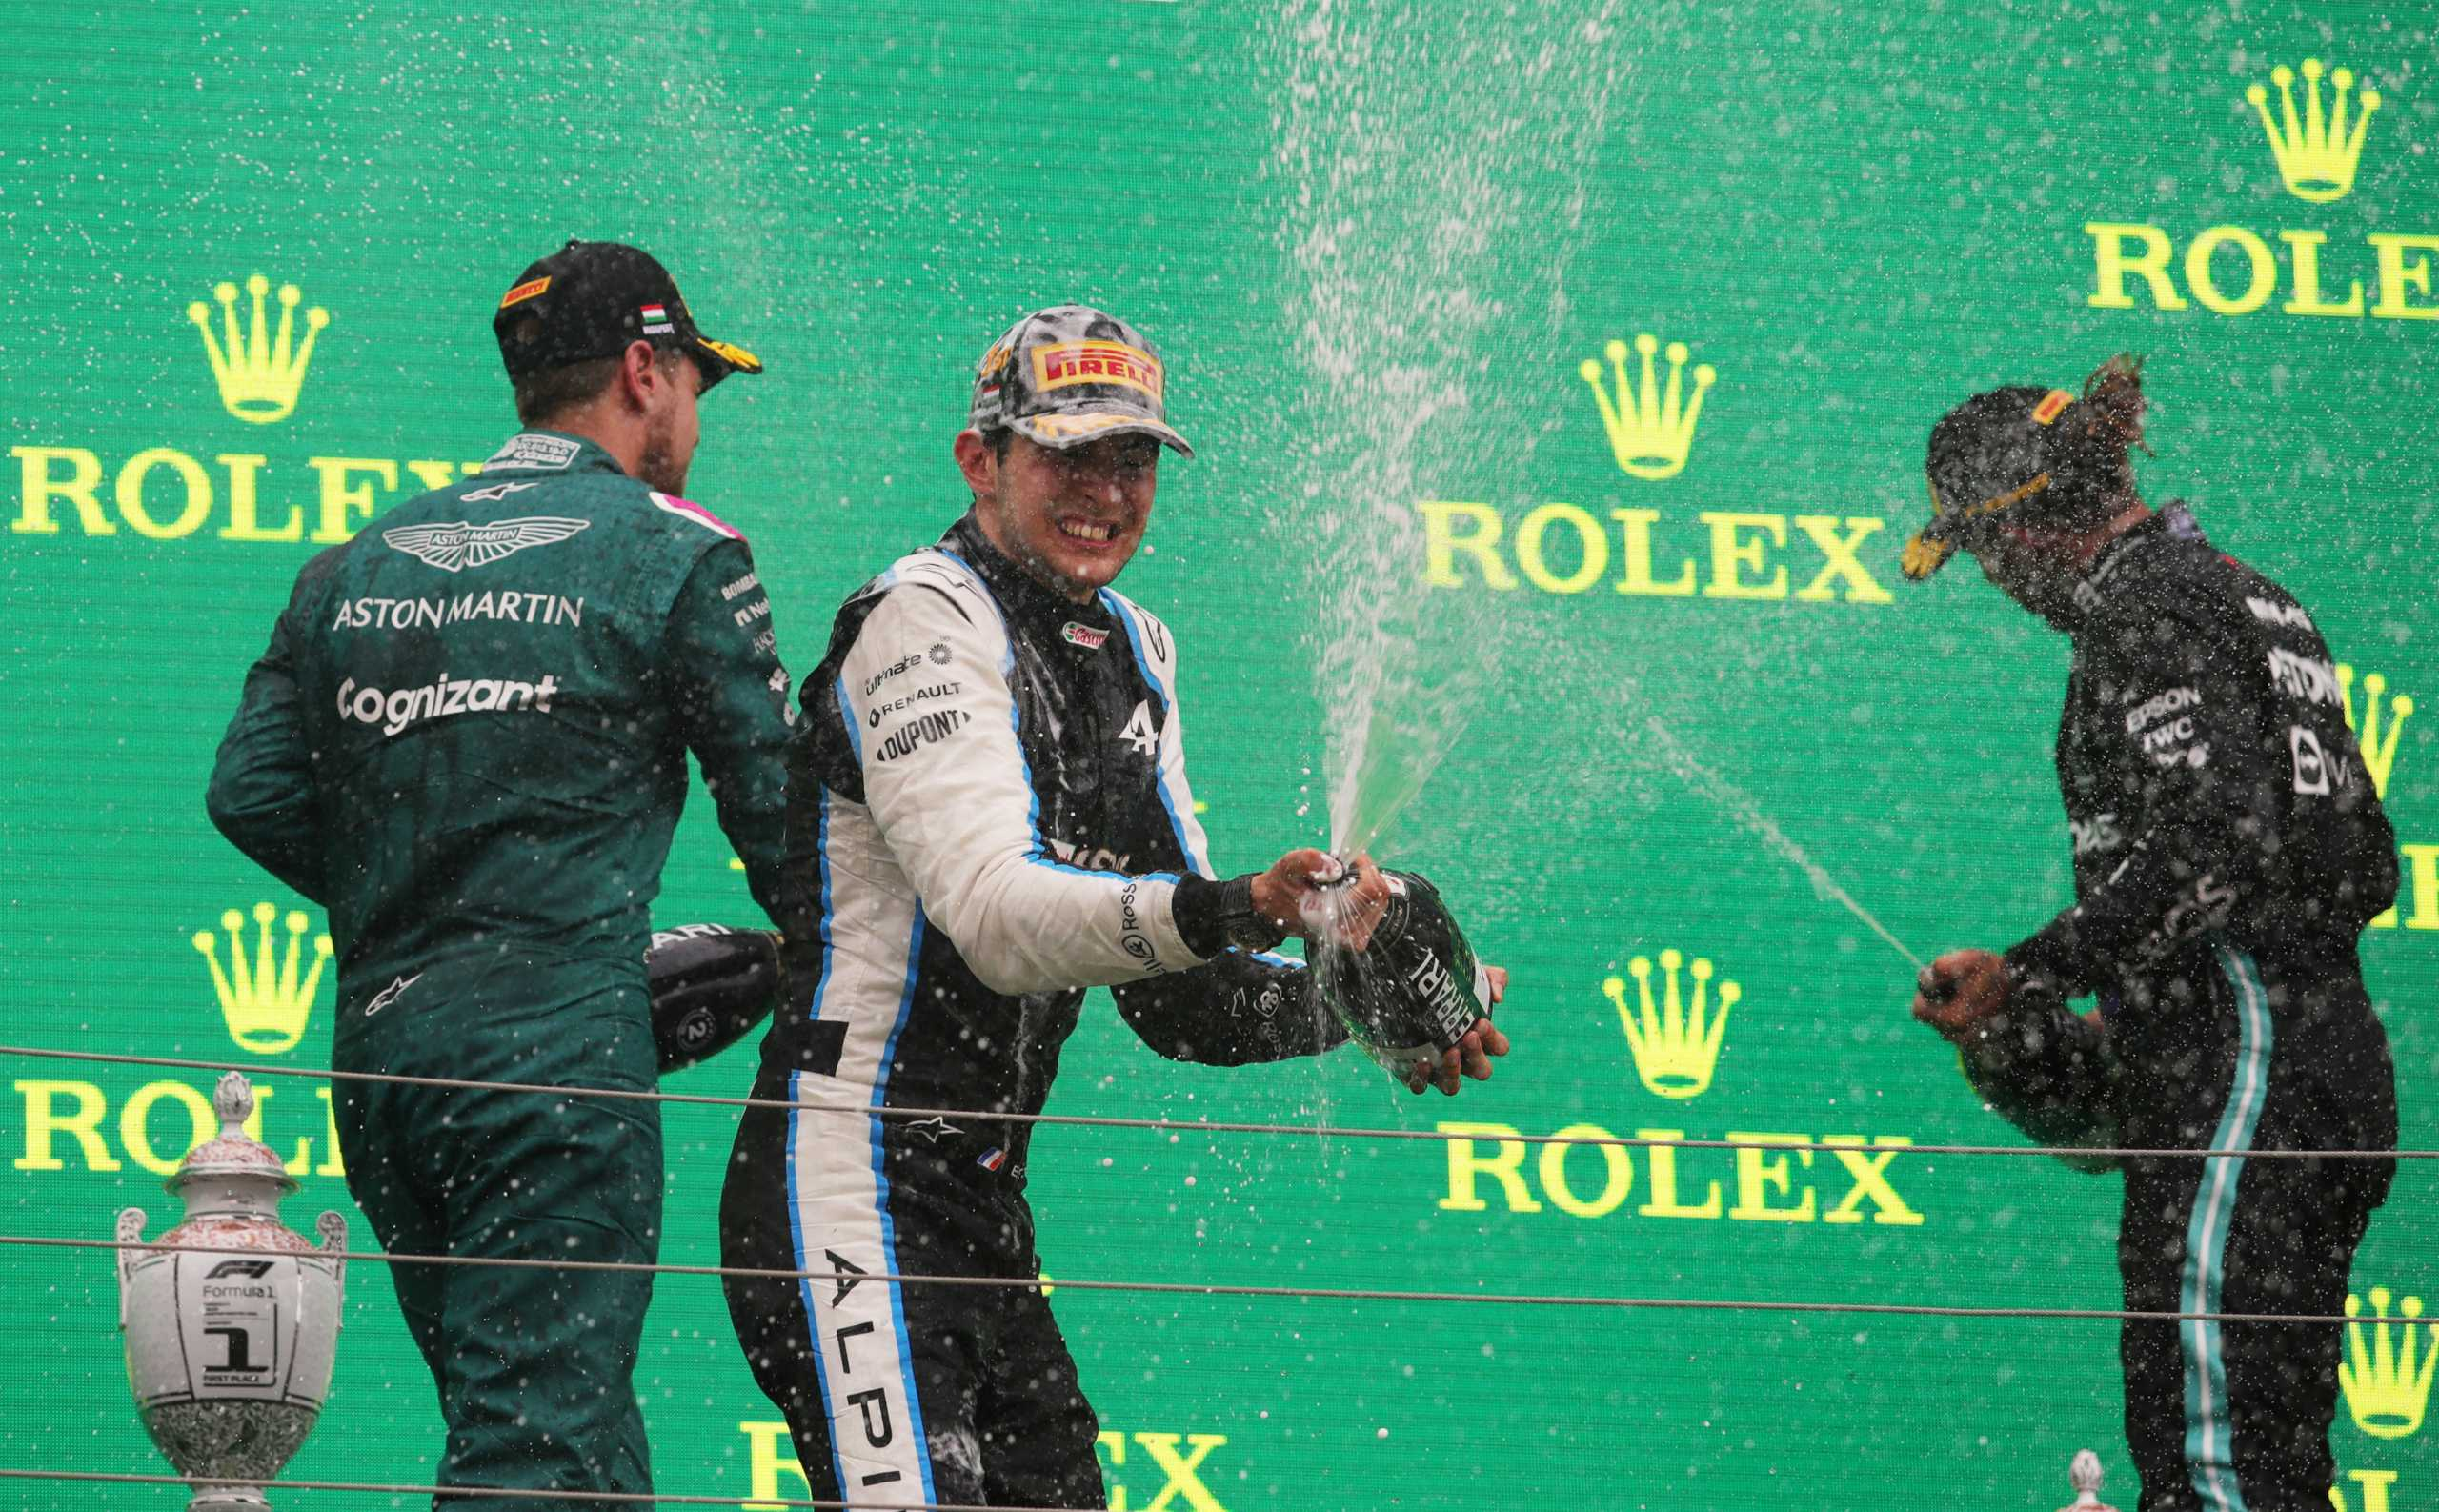 Formula 1: Ιστορική νίκη για Οκόν στο «χάος» του Grand Prix της Ουγγαρίας